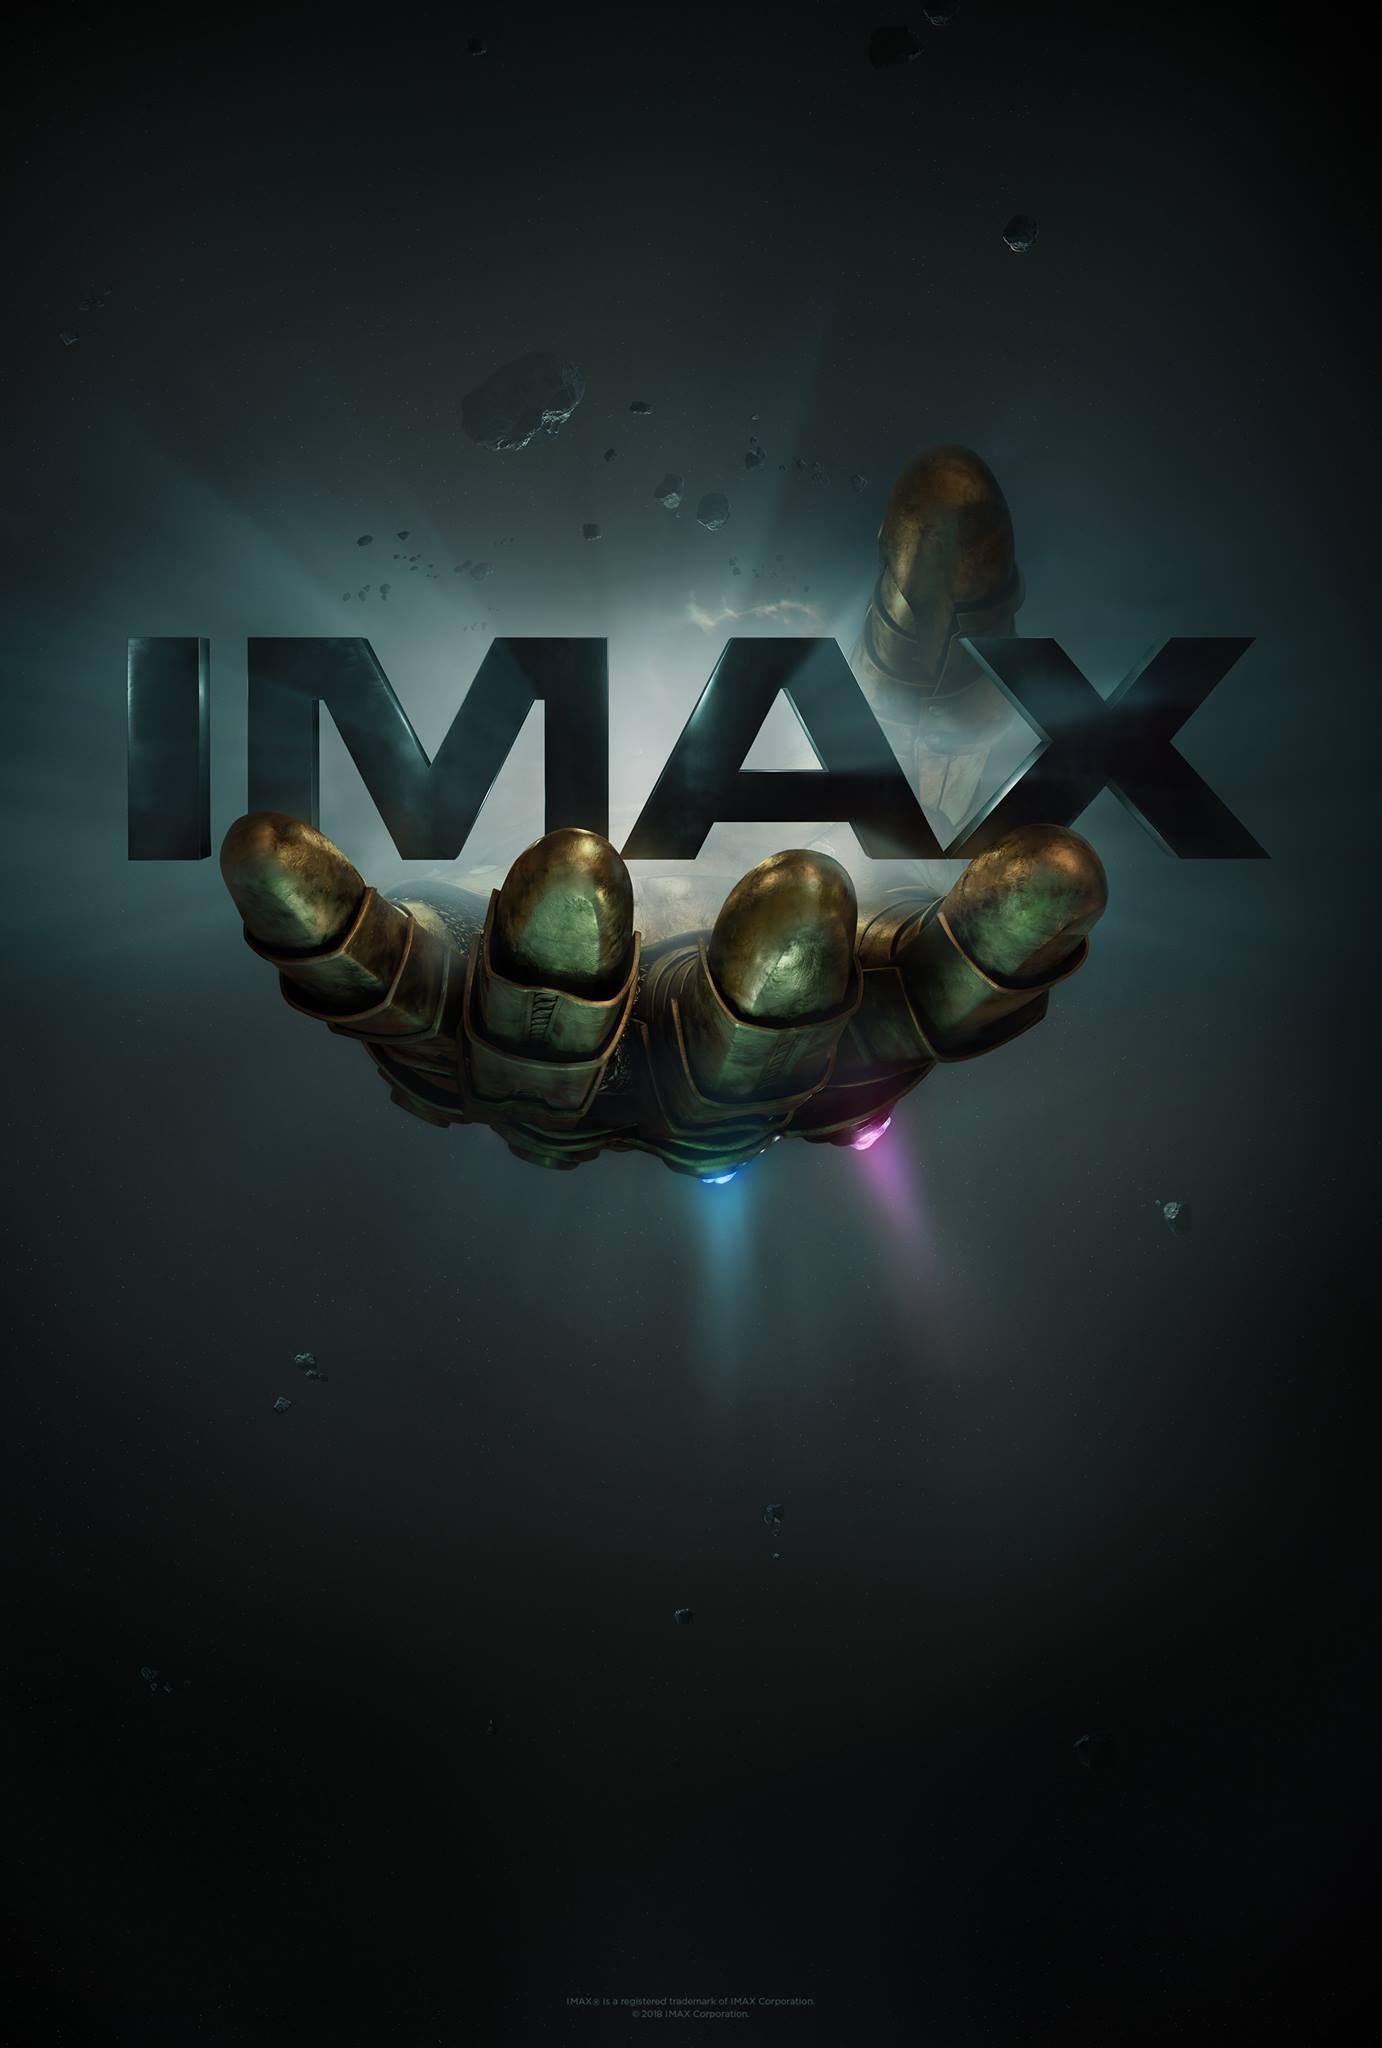 New poster for Avengers: Infinity War